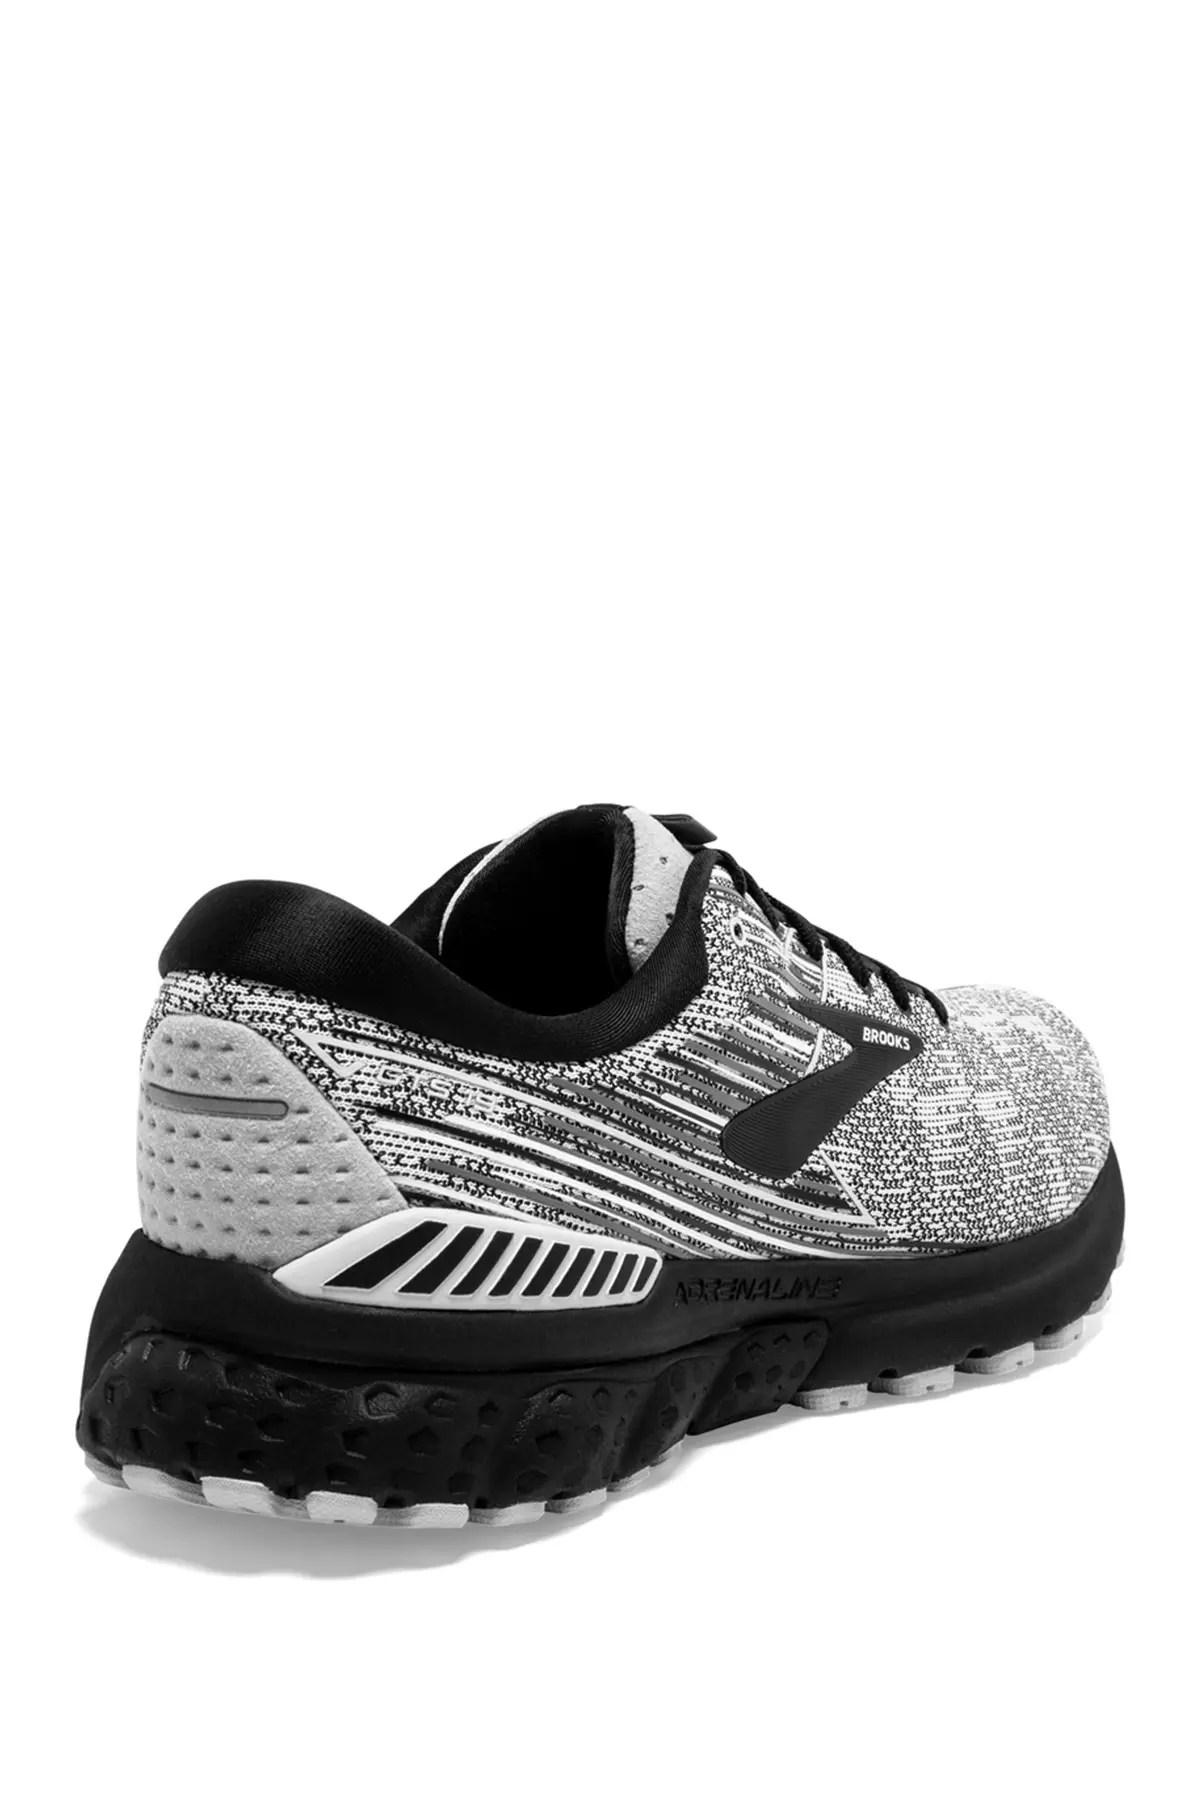 brooks adrenaline gts 19 running sneaker multiple widths available nordstrom rack